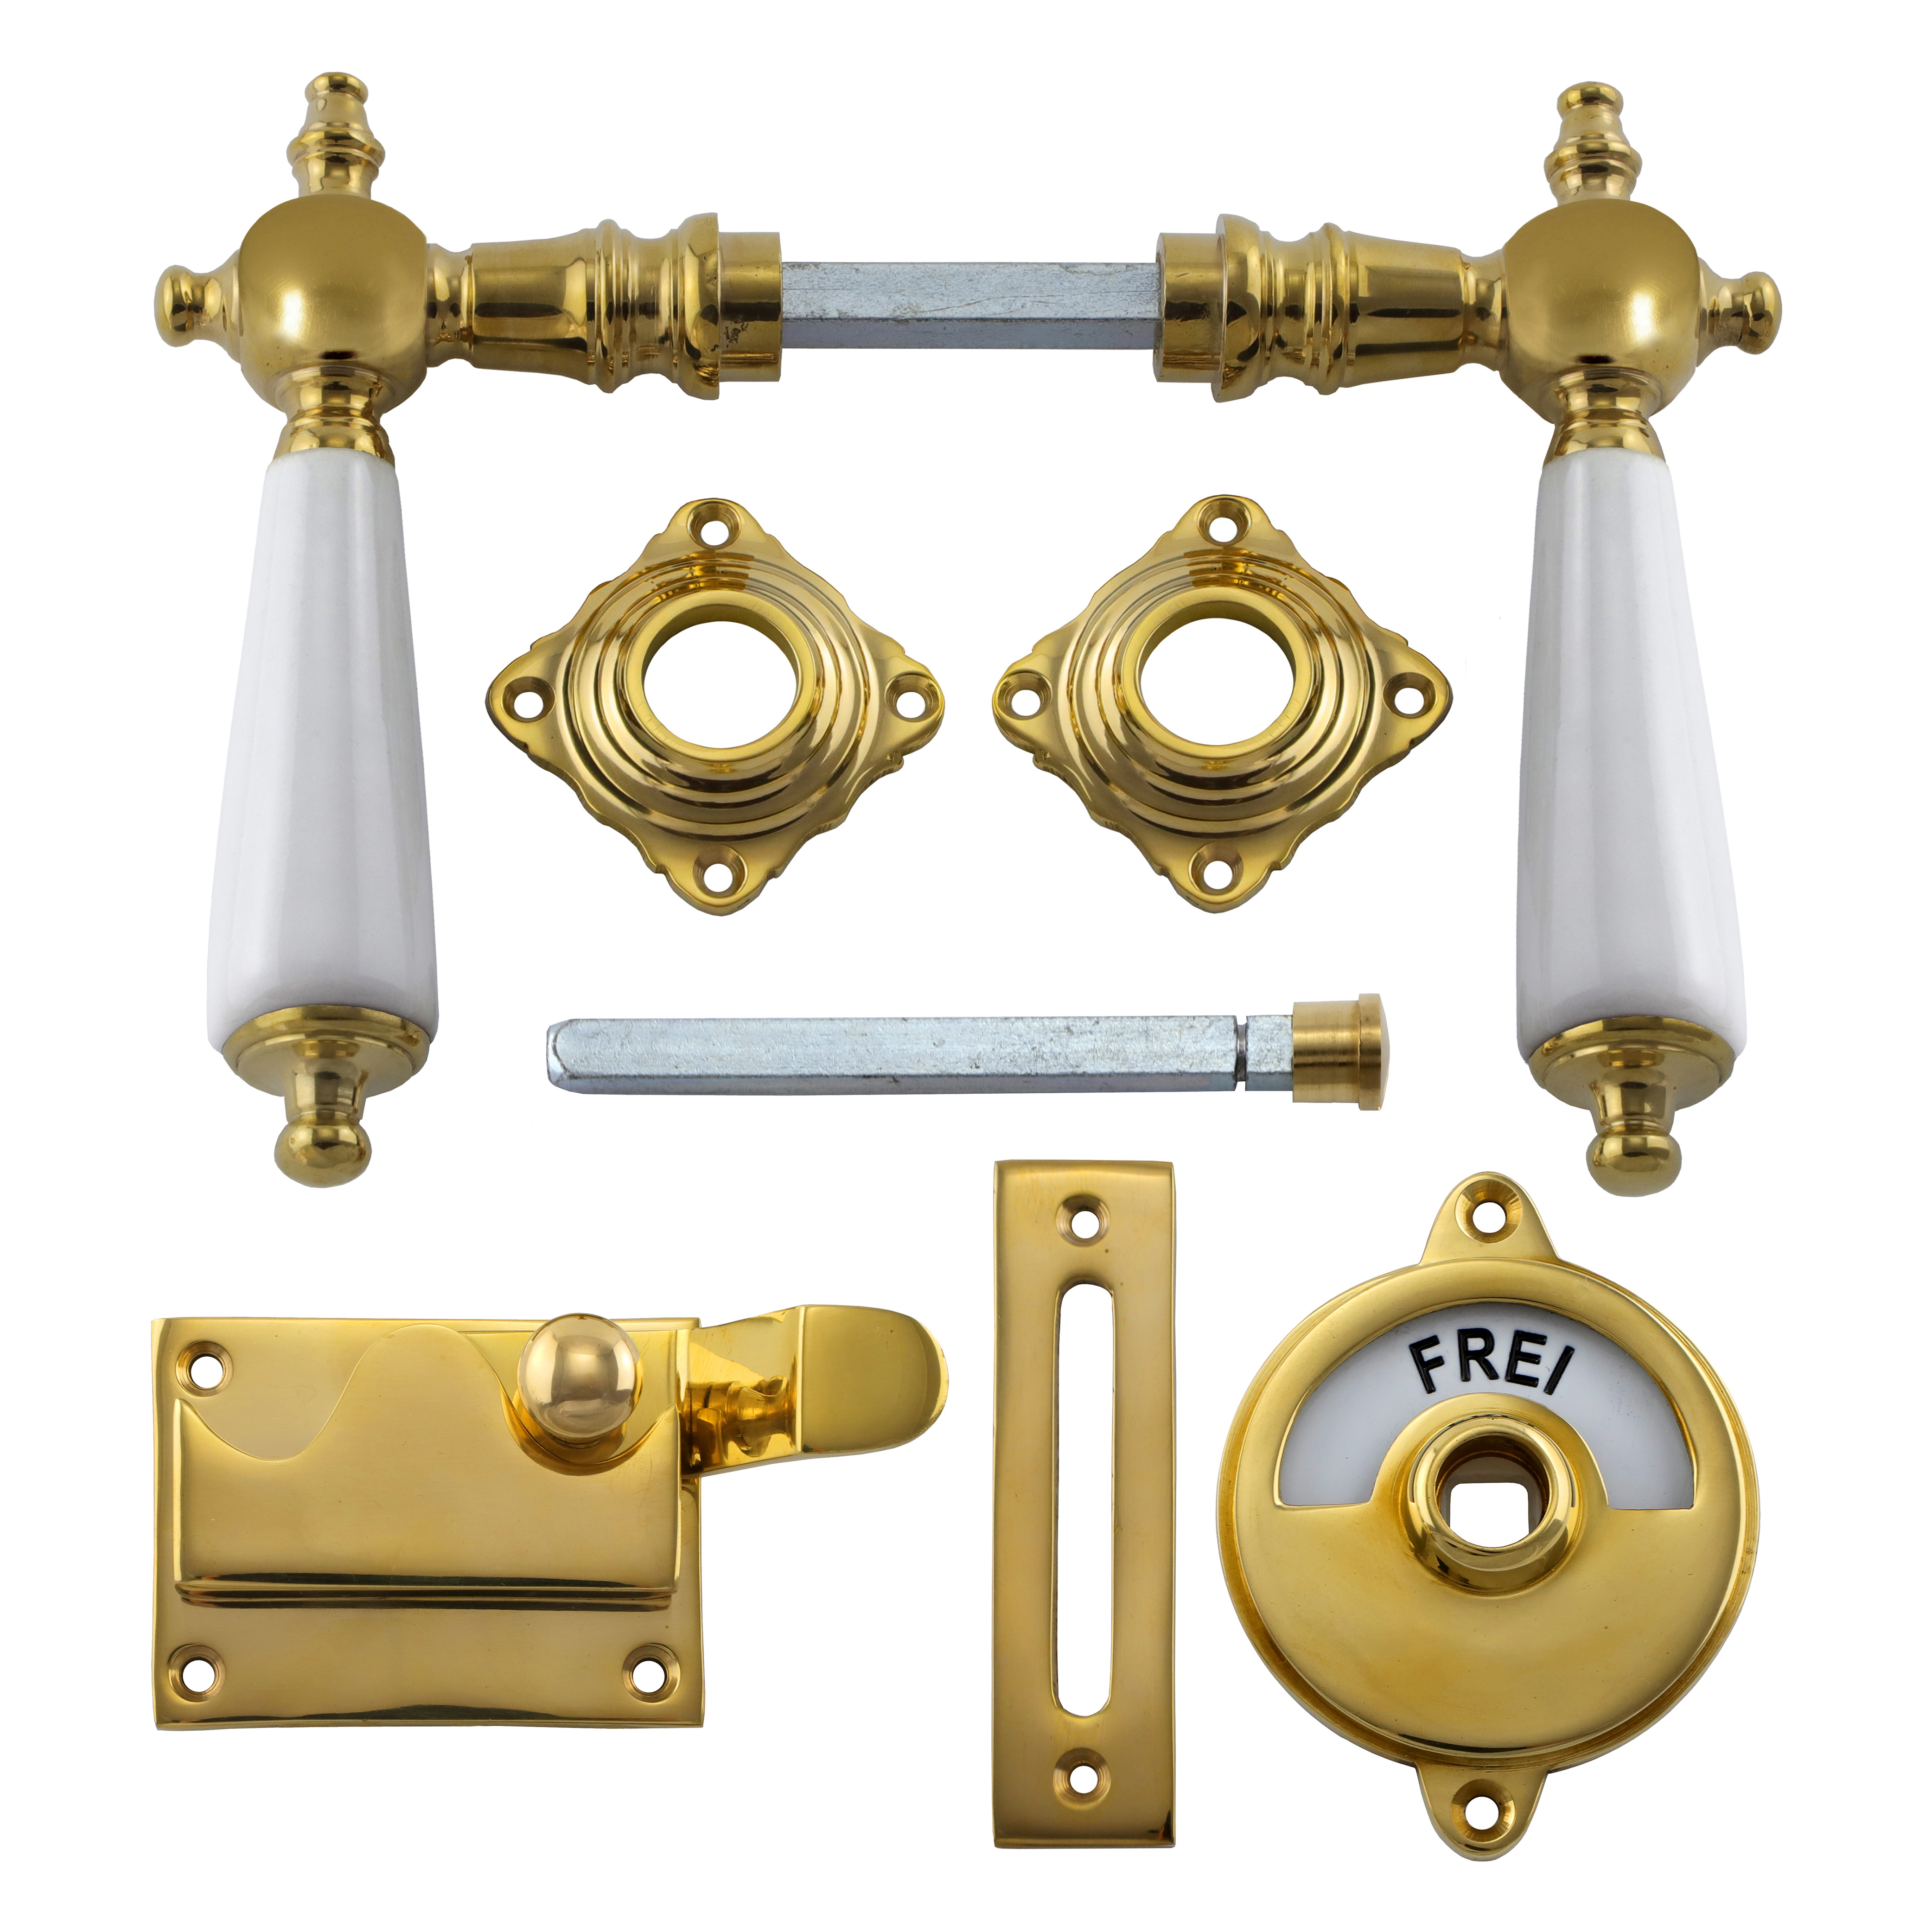 341.0014.35 WC-Türbeschlag / Riegel gekröpft / Verschluss mit Anzeige Messing poliert